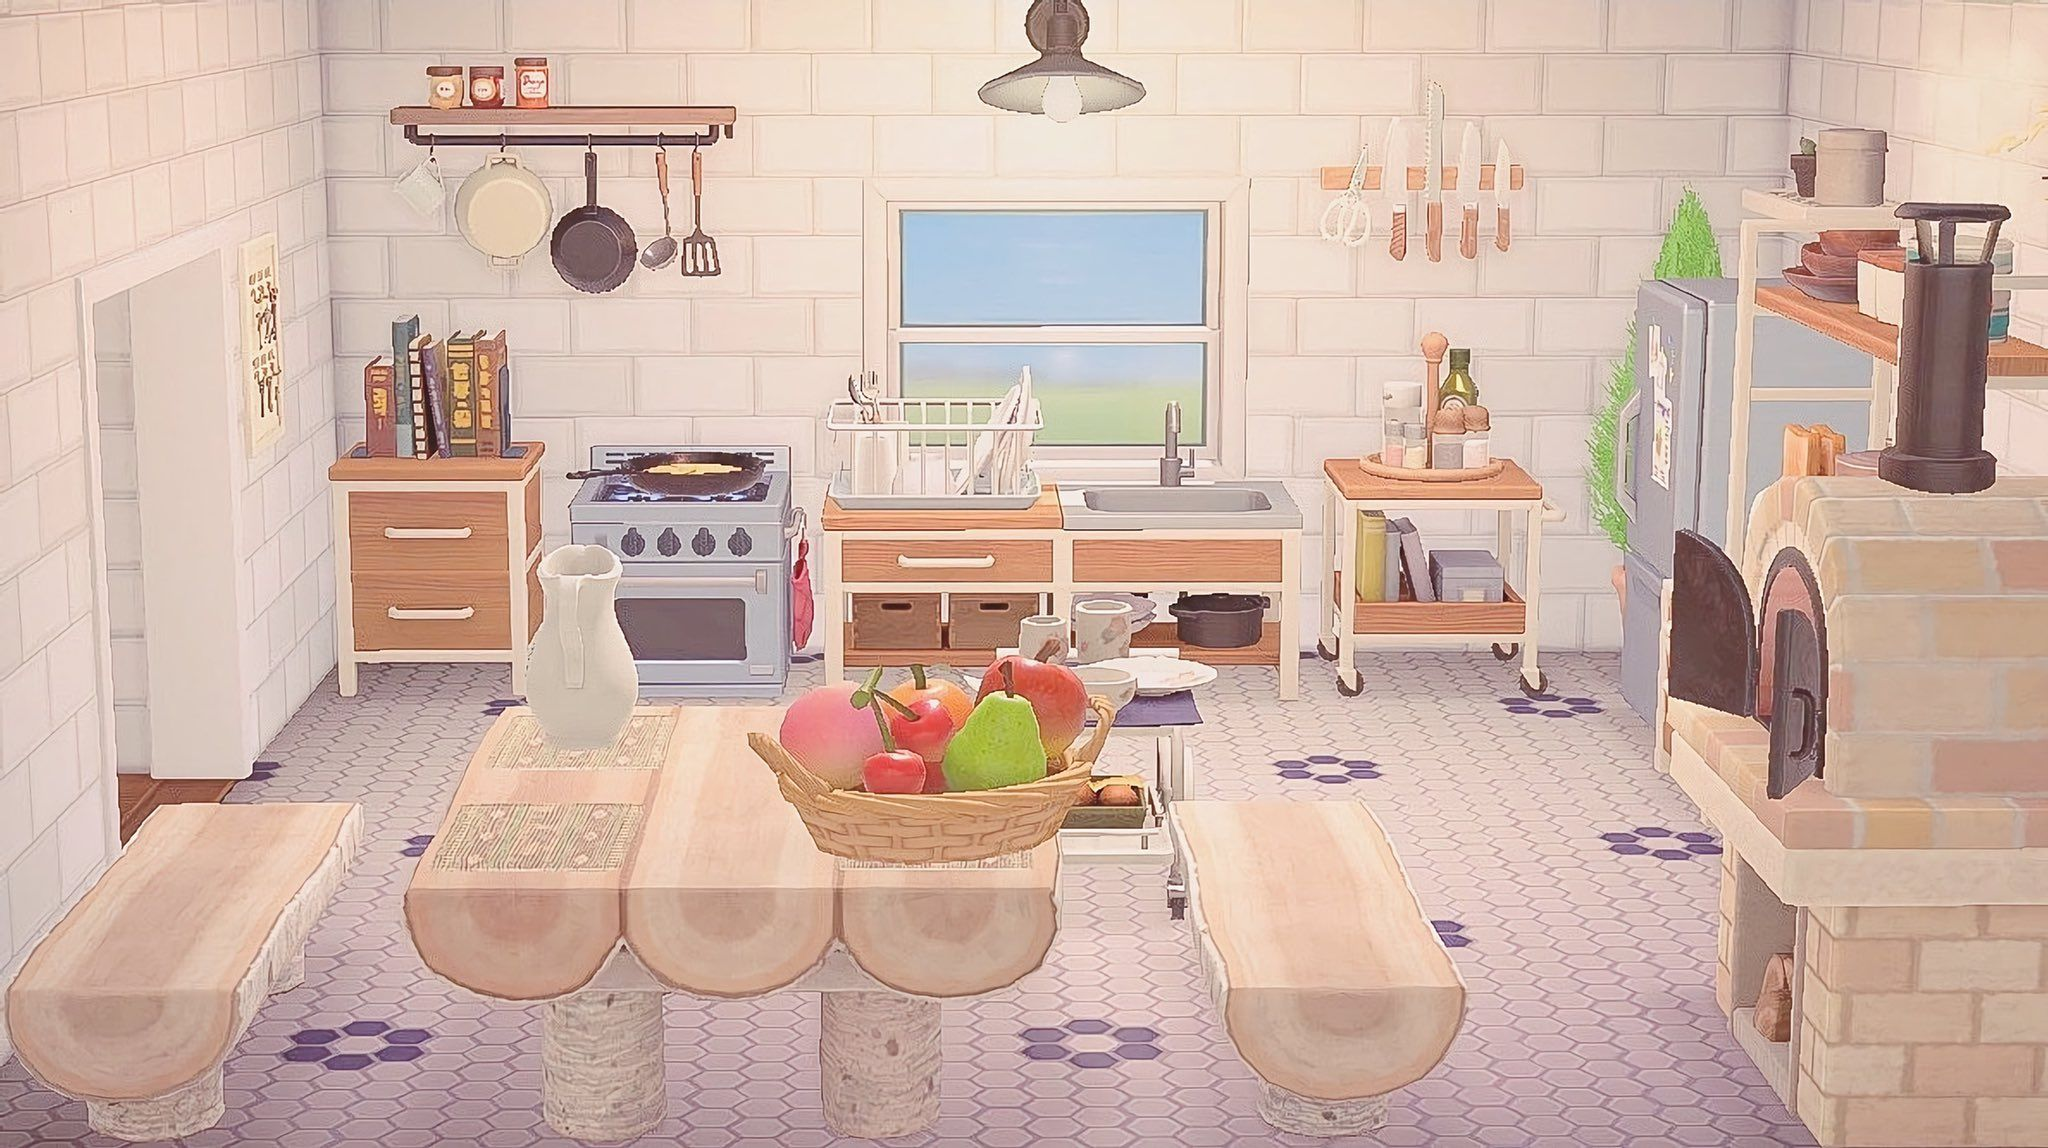 Kitchen Island Counter Animal Crossing New Horizons ... on Kitchen Counter Animal Crossing  id=49142